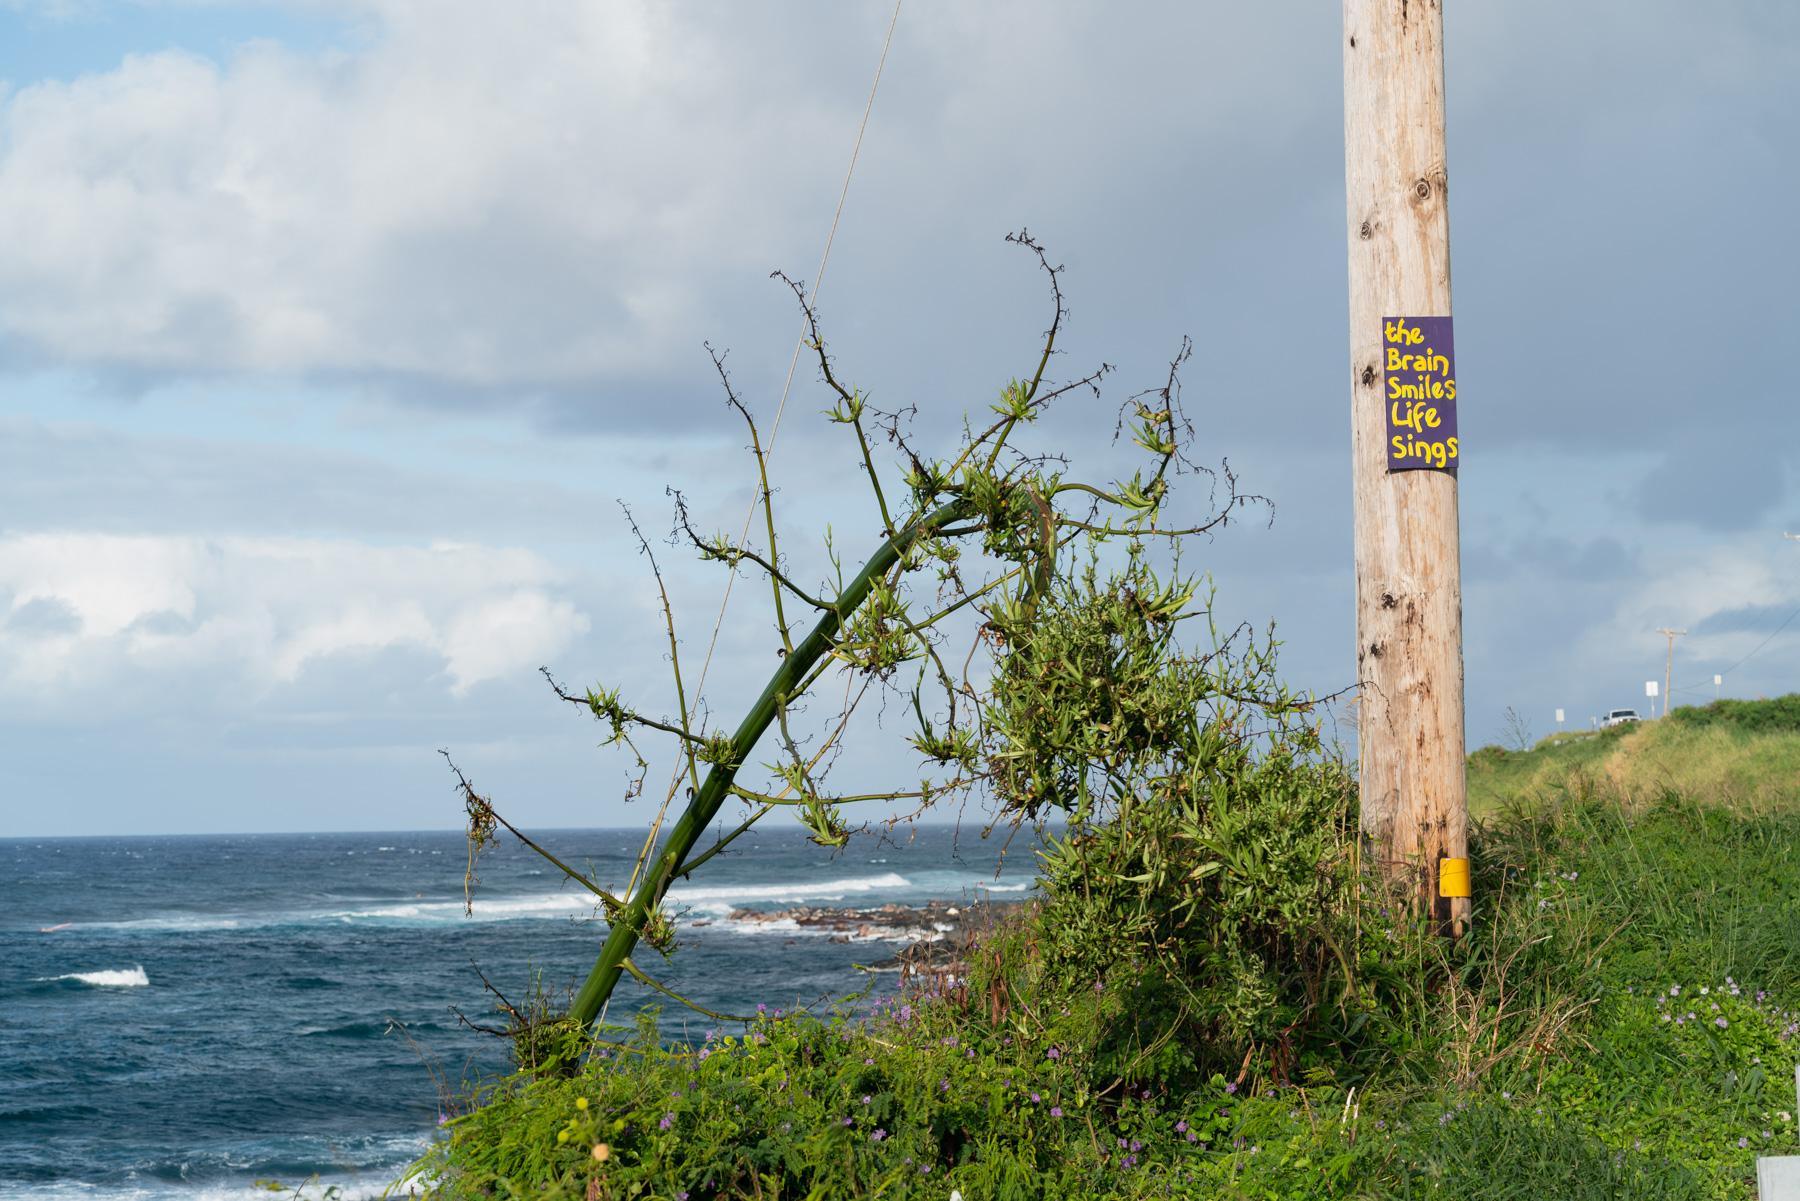 Maui-Trip-Kite-24.jpg